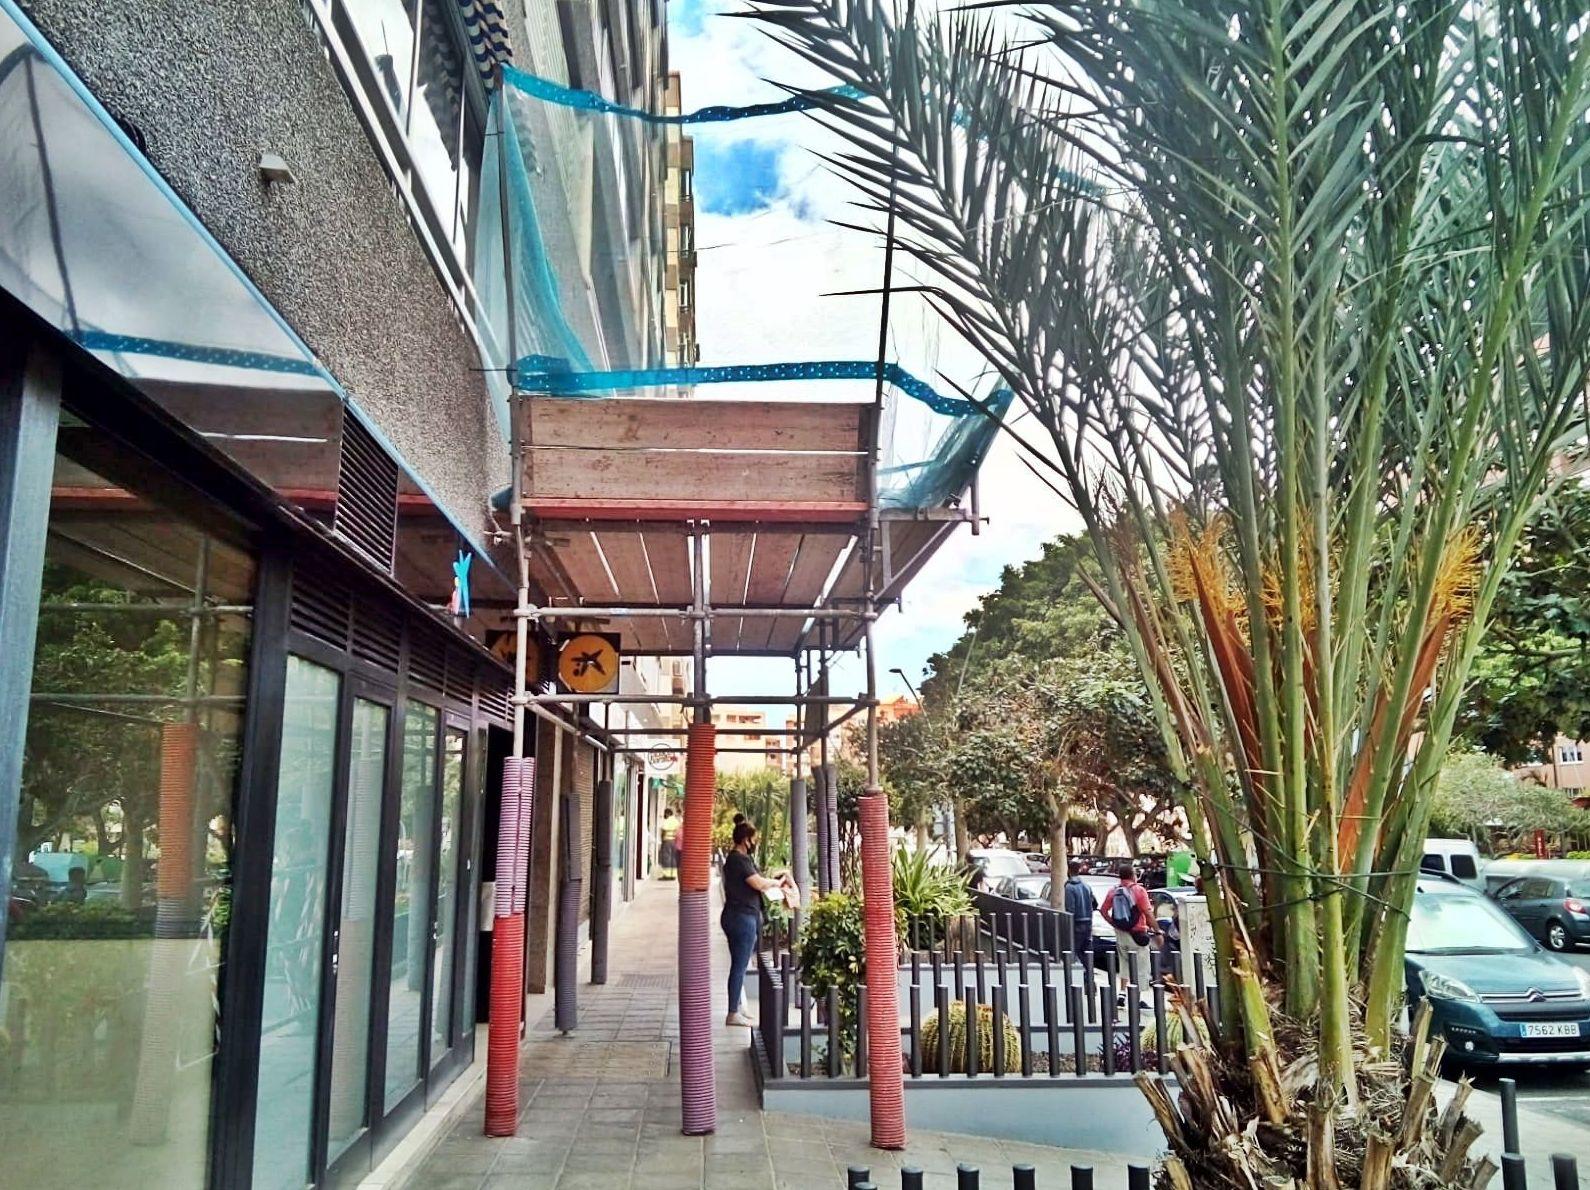 Alquiler y montaje de andamios. Tenerife.